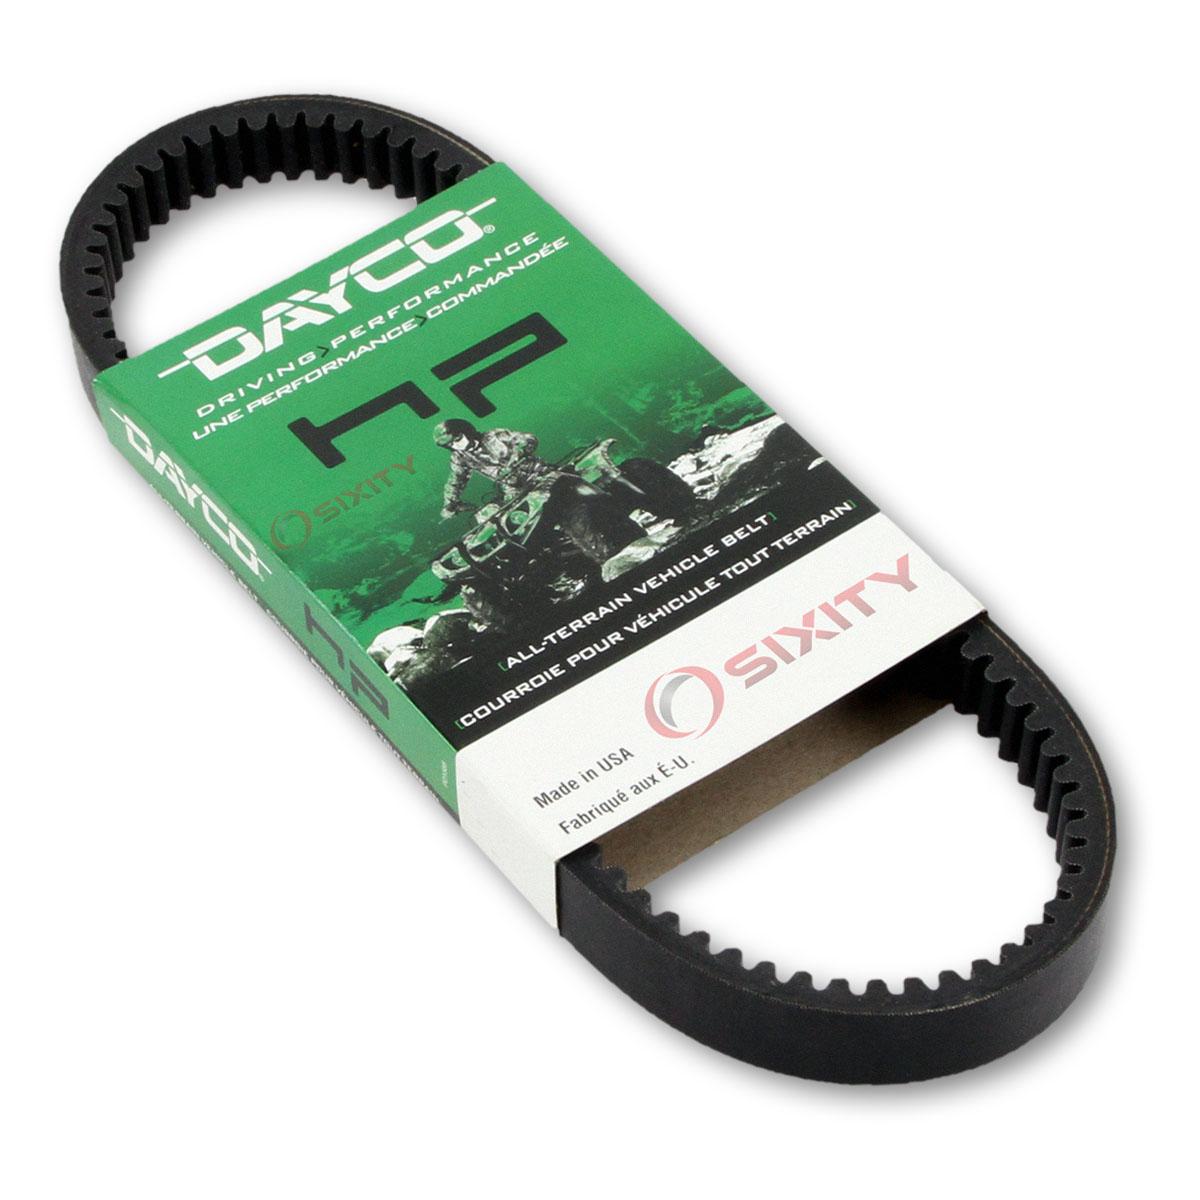 2006-2012 3211077 Polaris Sportsman 500 HO 4x4 Drive Belt